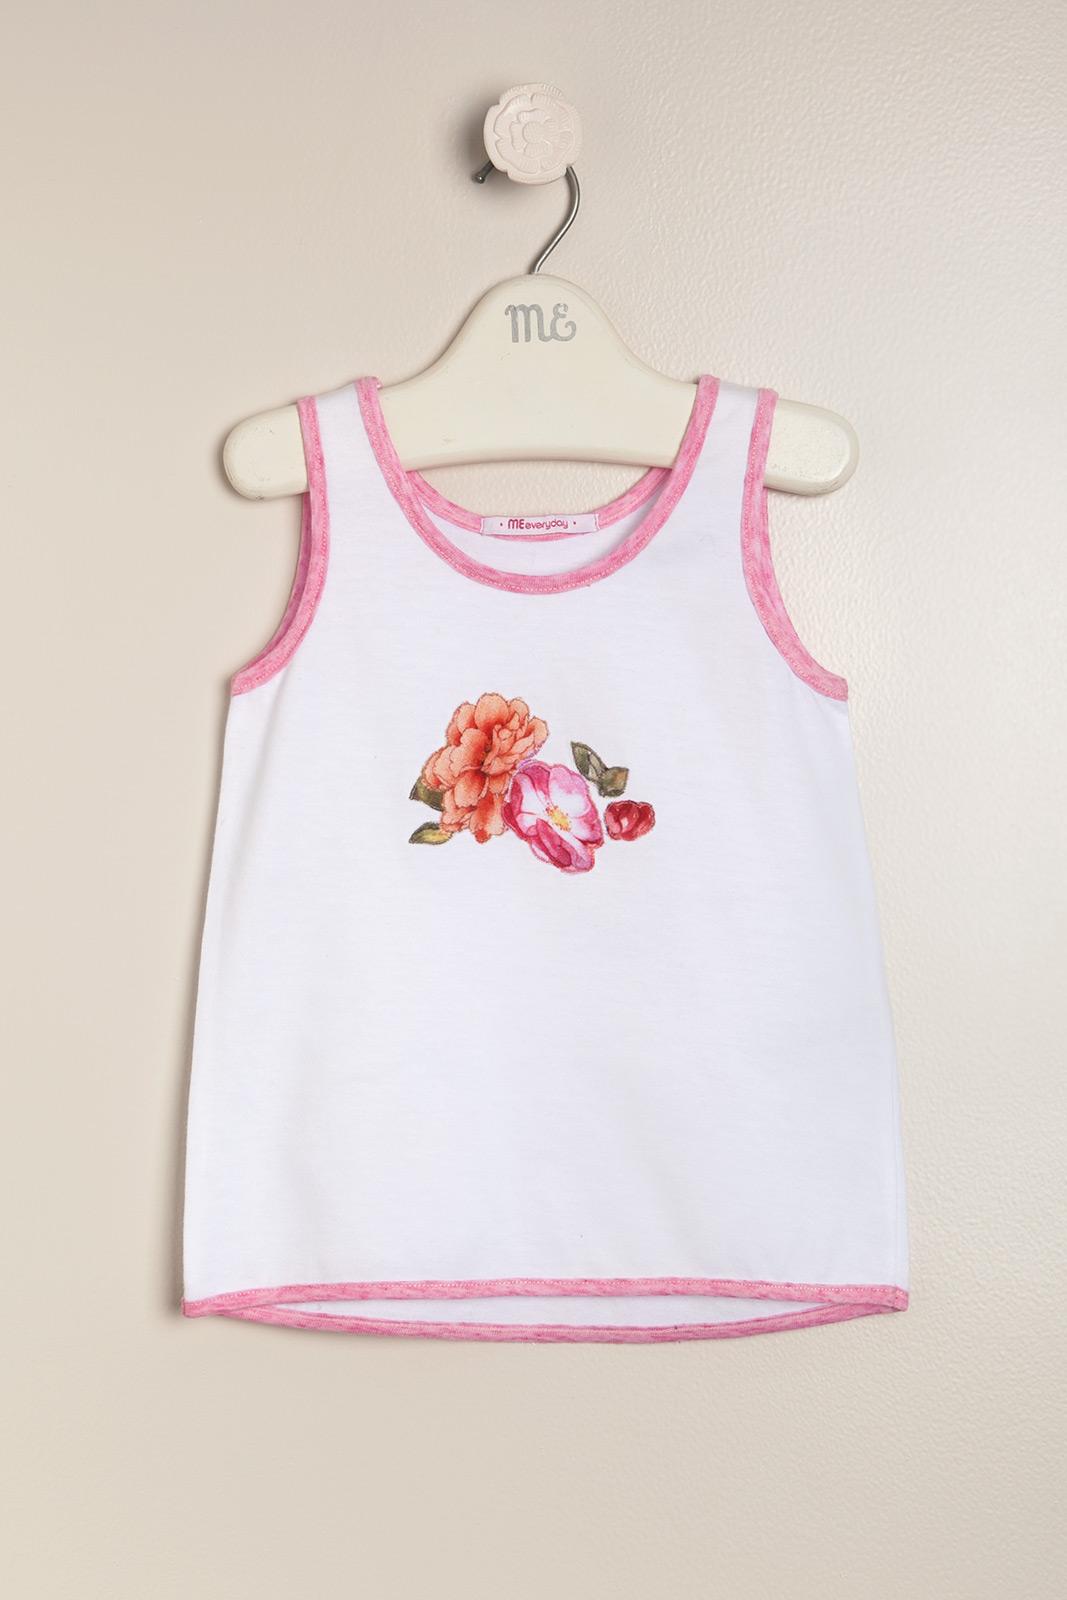 Musculosa con flores lulu